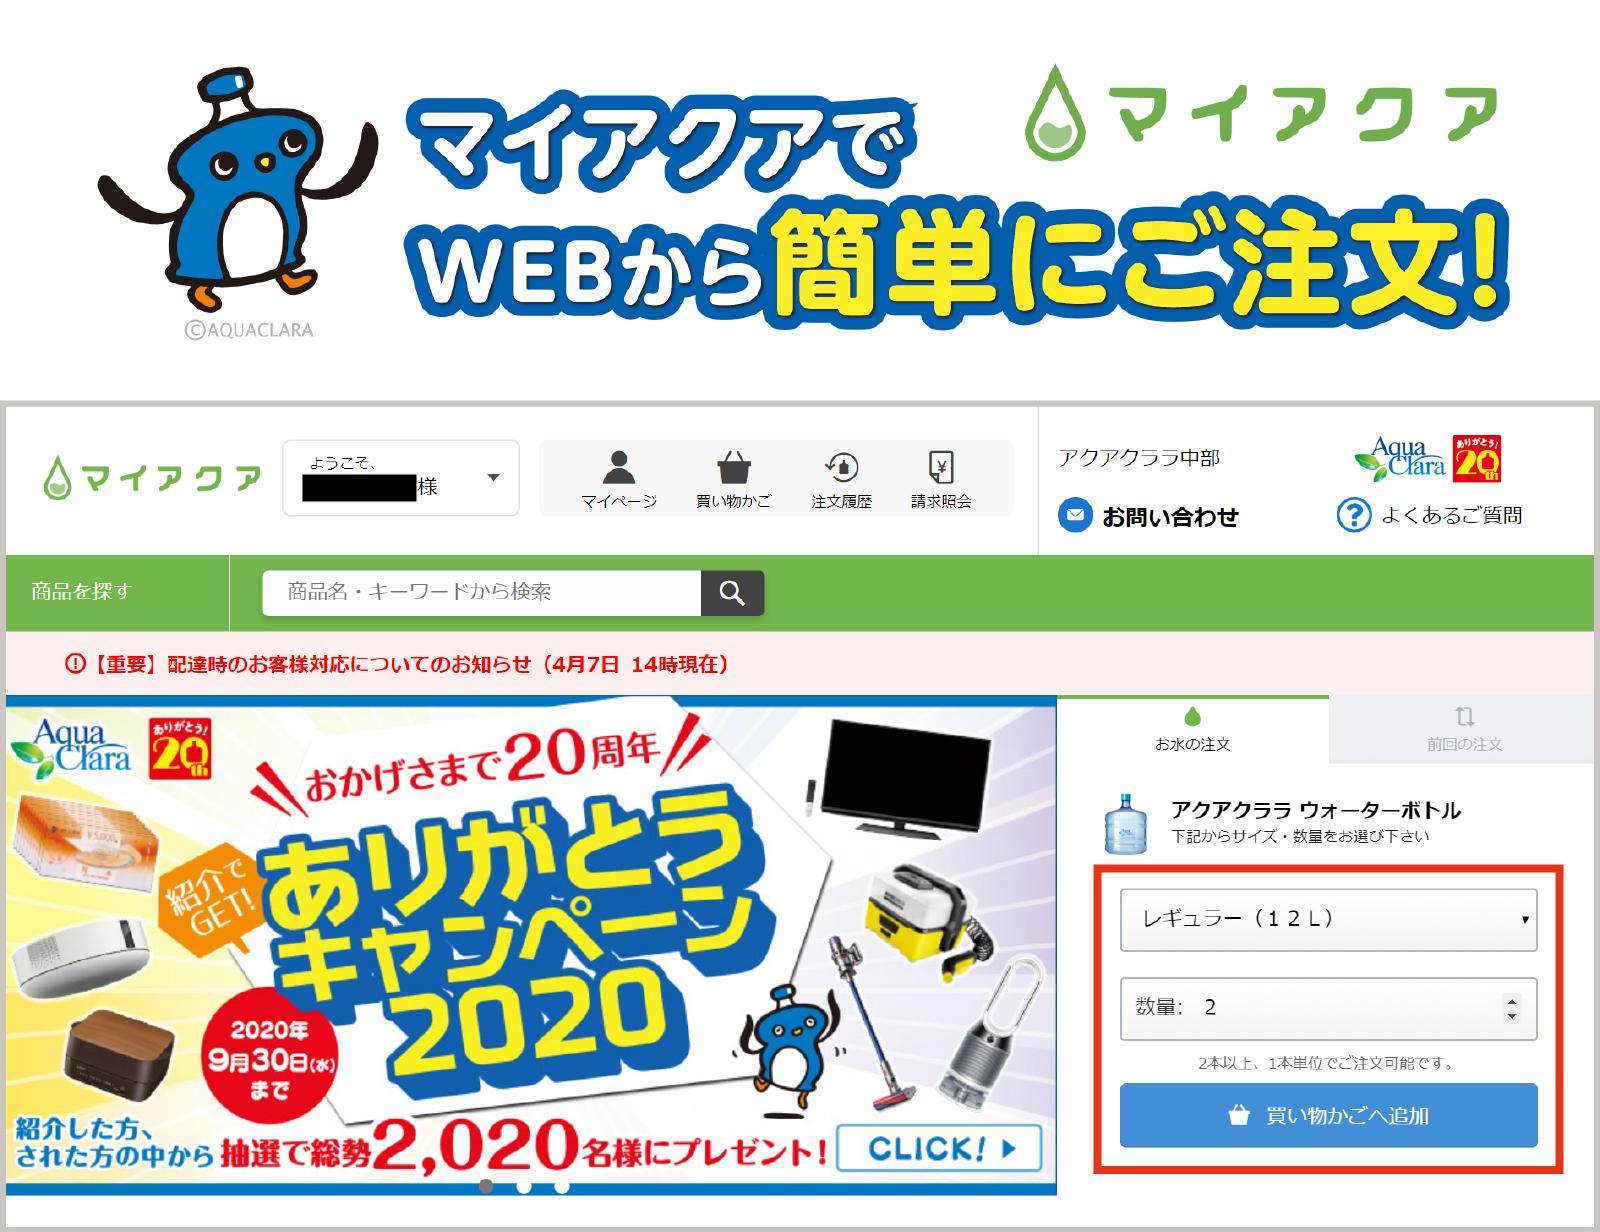 WEBから簡単注文